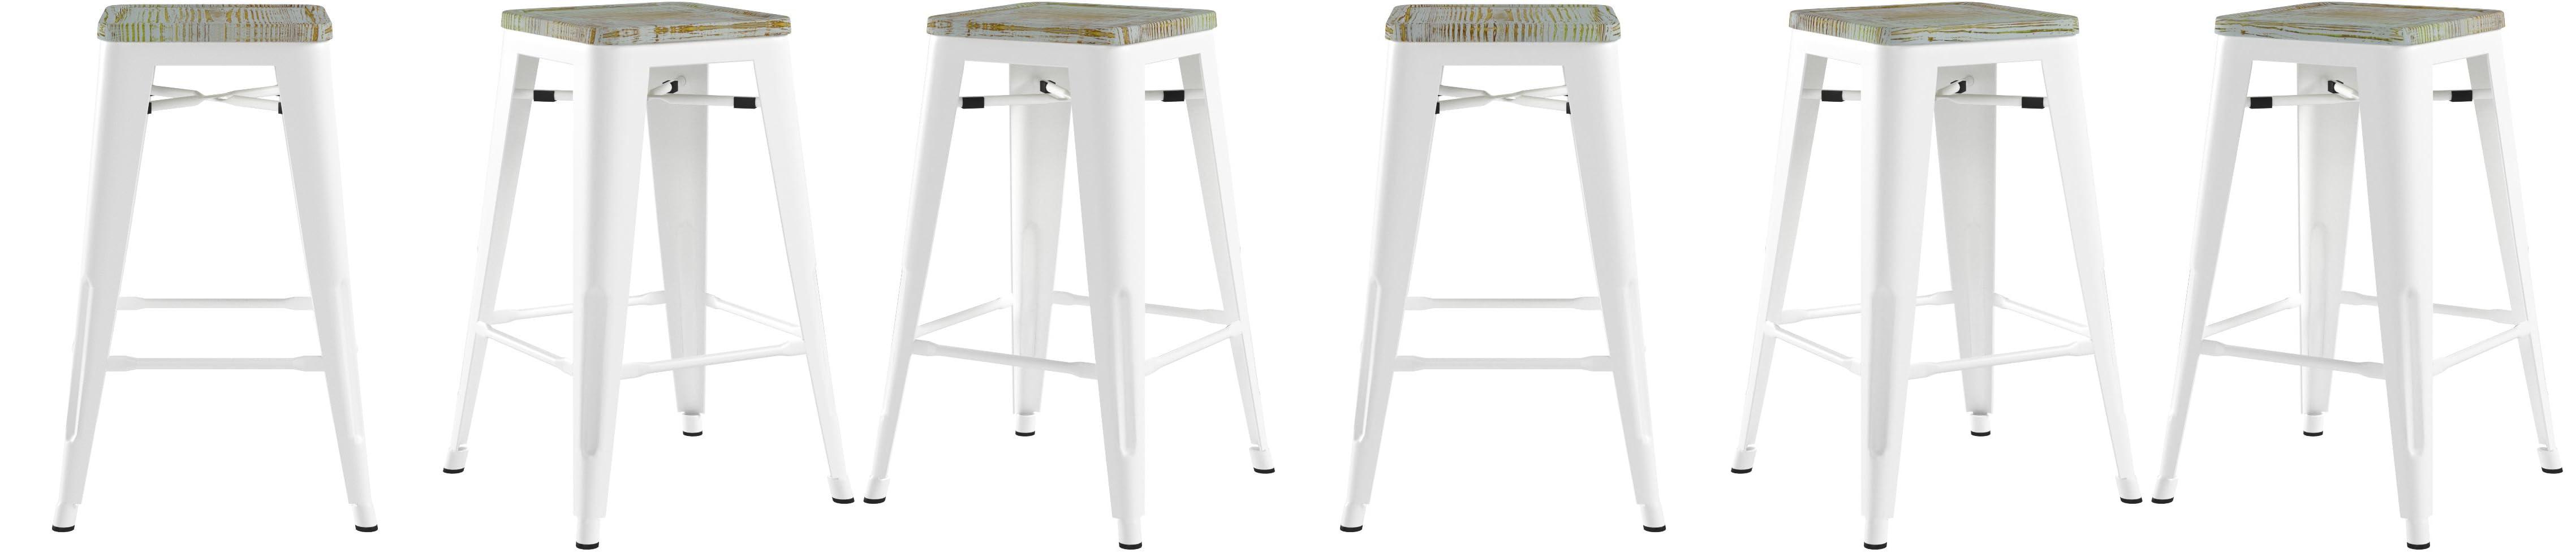 Amazon Com Osp Home Furnishings Bristow Antique Metal Barstool With Vintage Wood Seat 26 Inch White Frame Pine Irish 4 Pack Furniture Decor